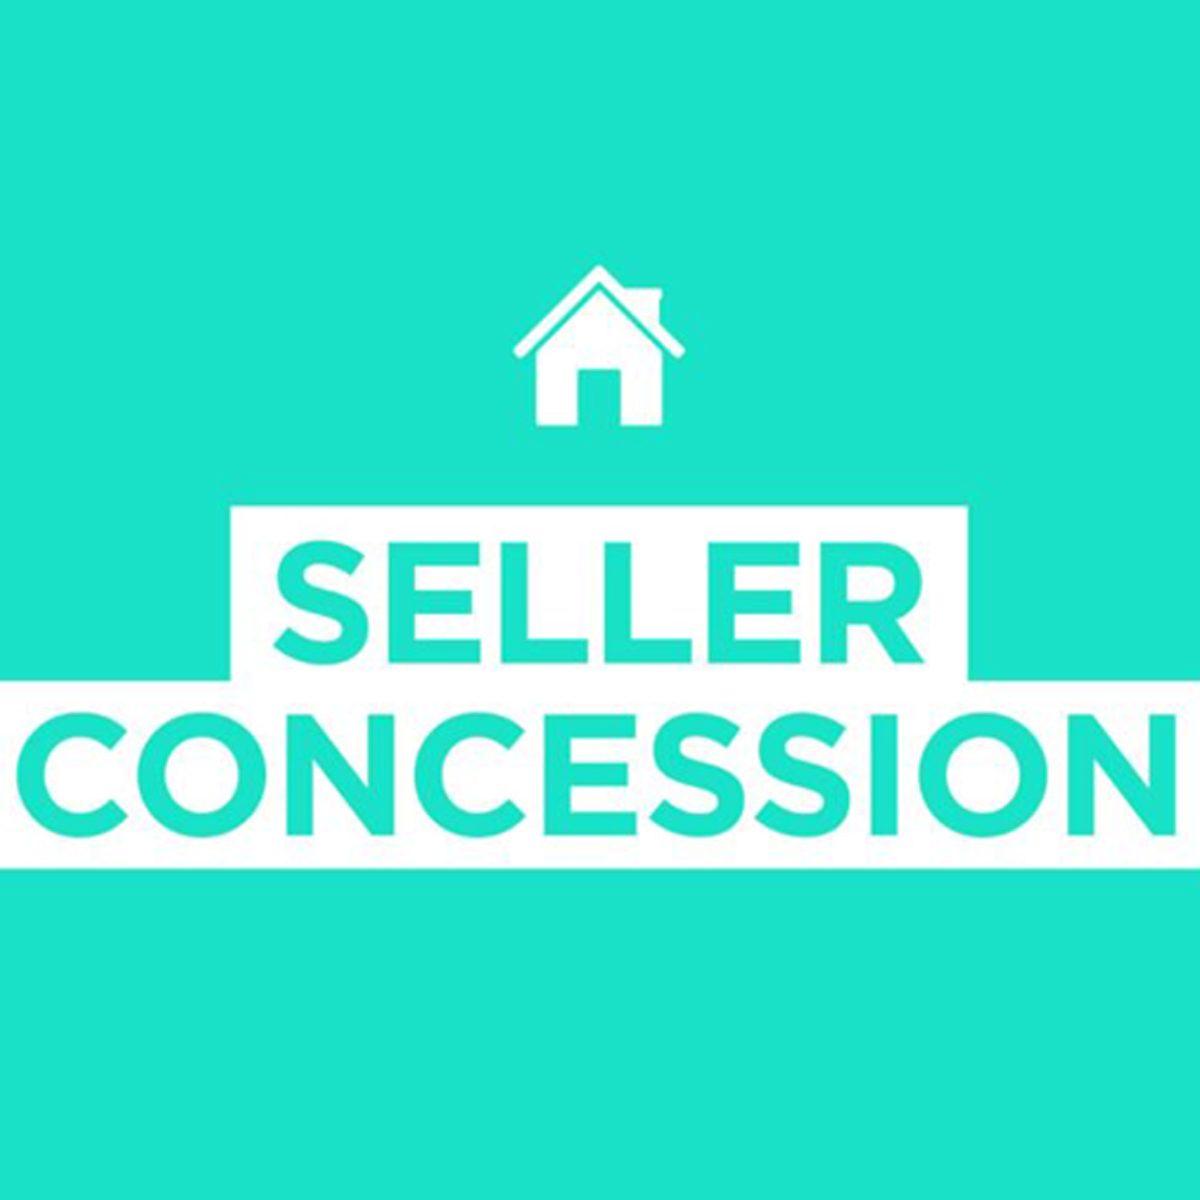 concession